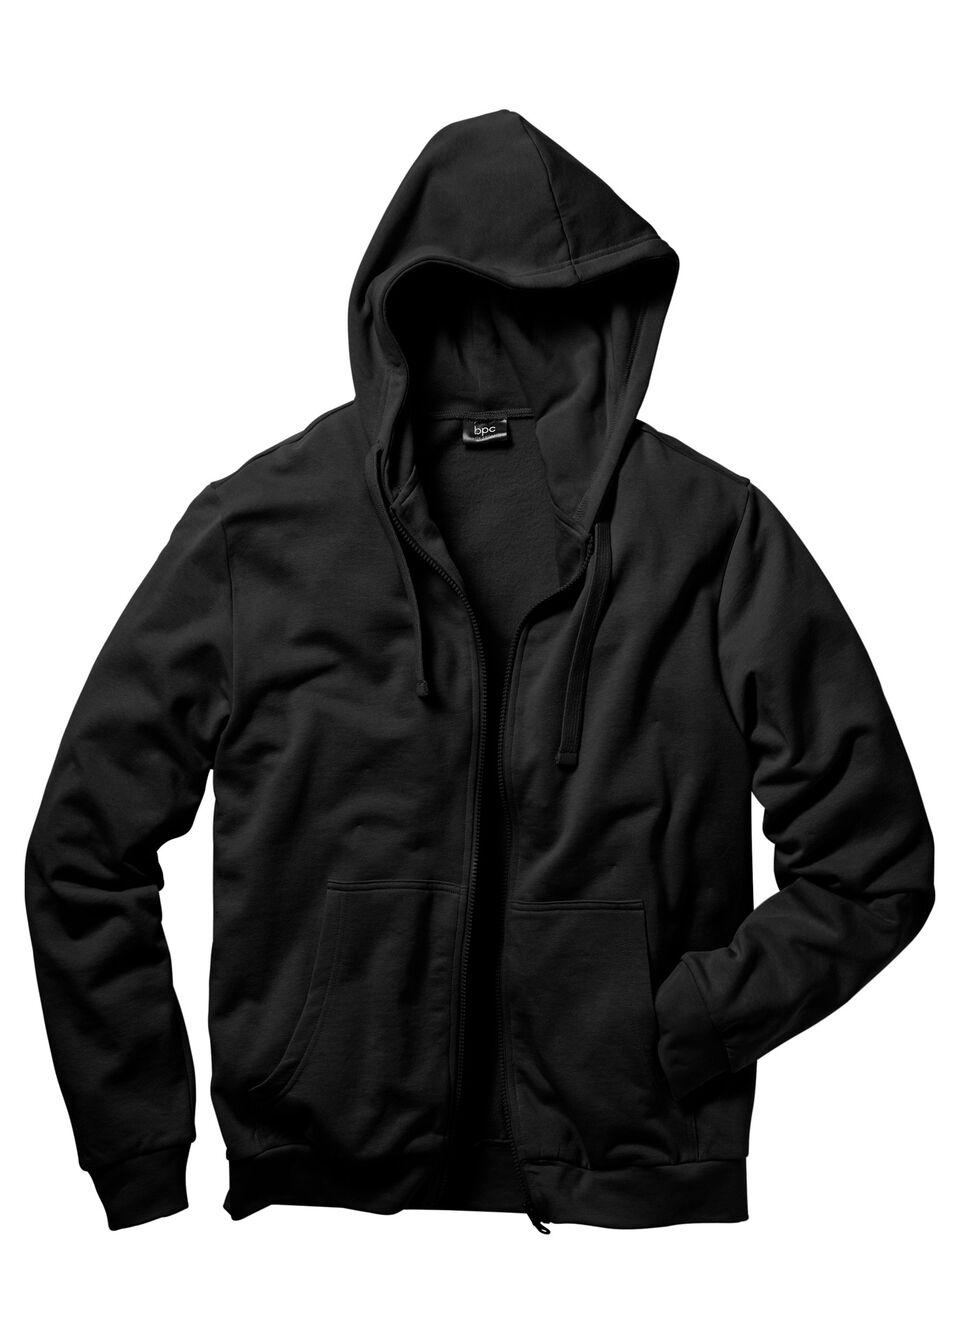 Куртка с капюшоном, трикотаж от bonprix